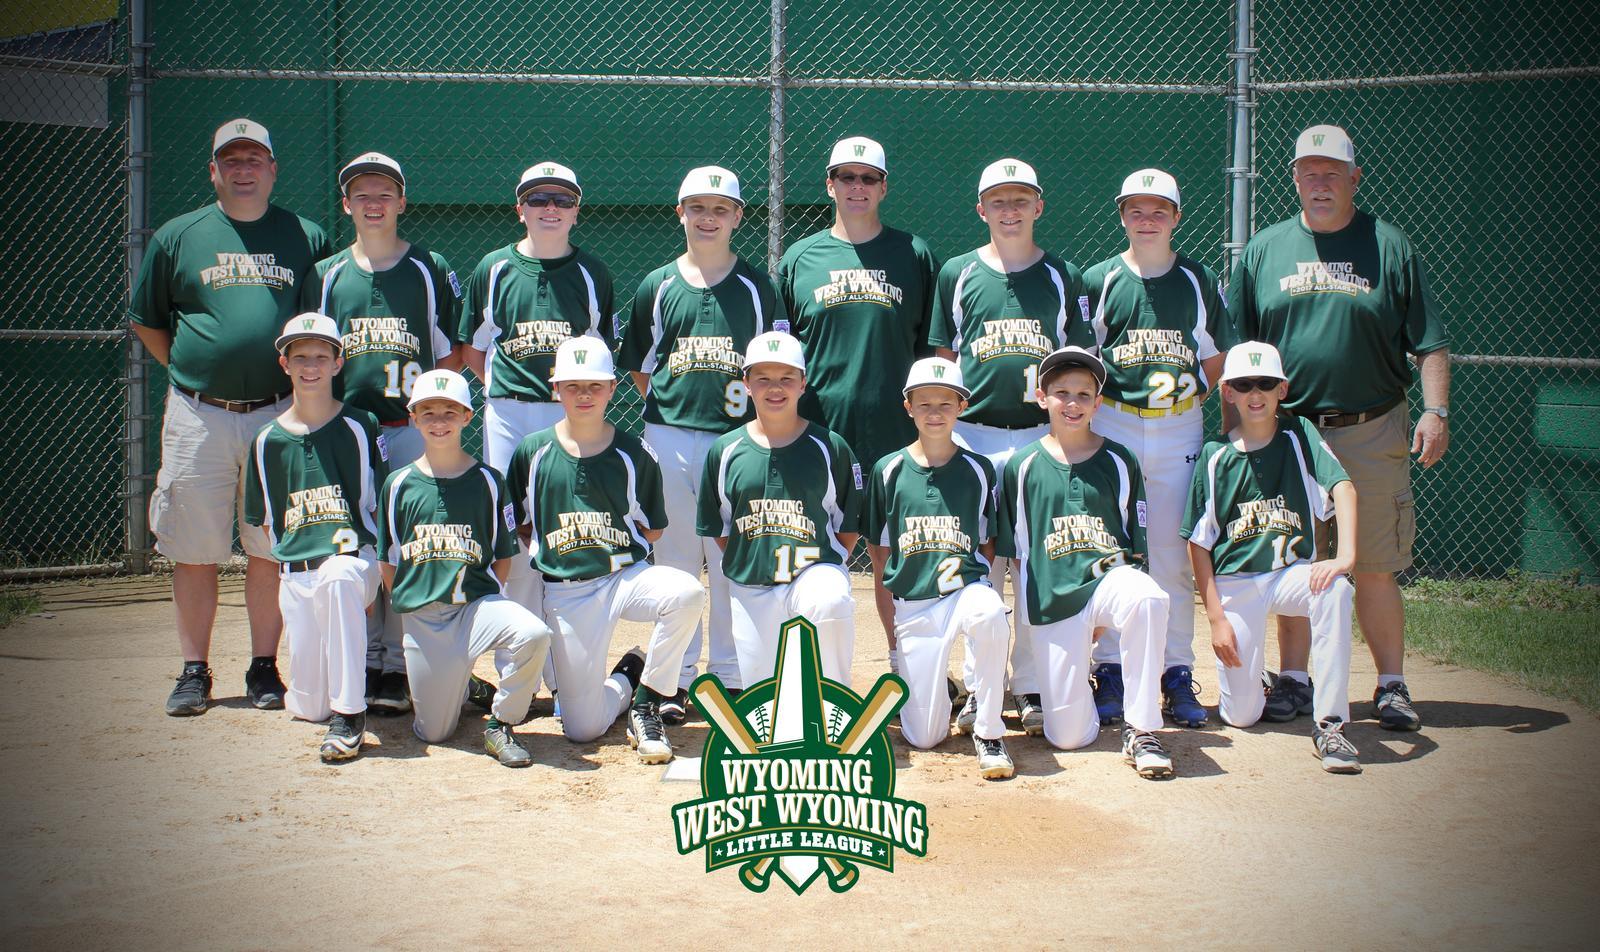 11-12 Baseball All-Stars